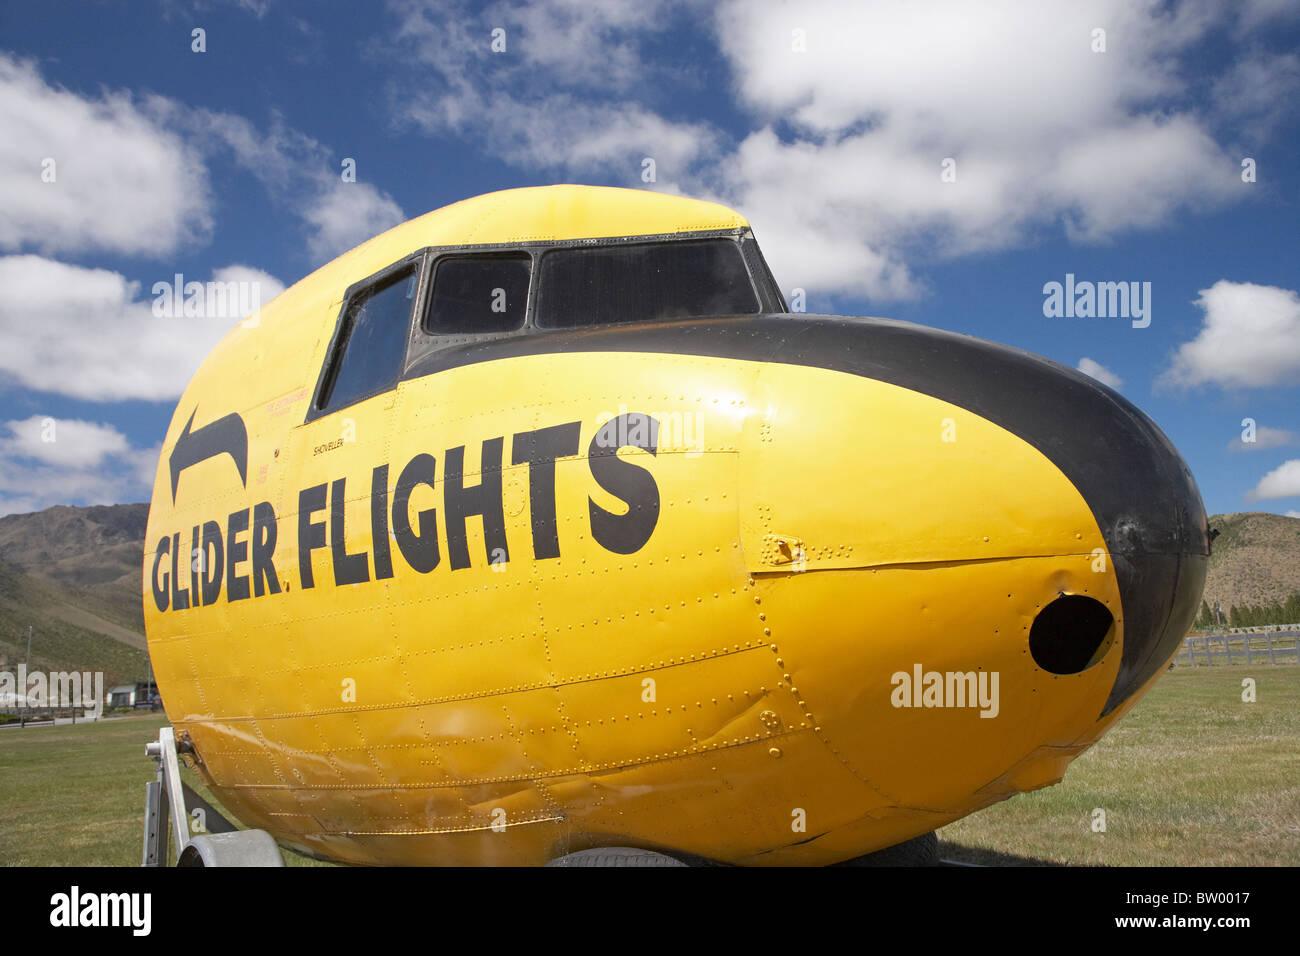 Glider Flights Sign, Omarama, North Otago, South Island, New Zealand - Stock Image